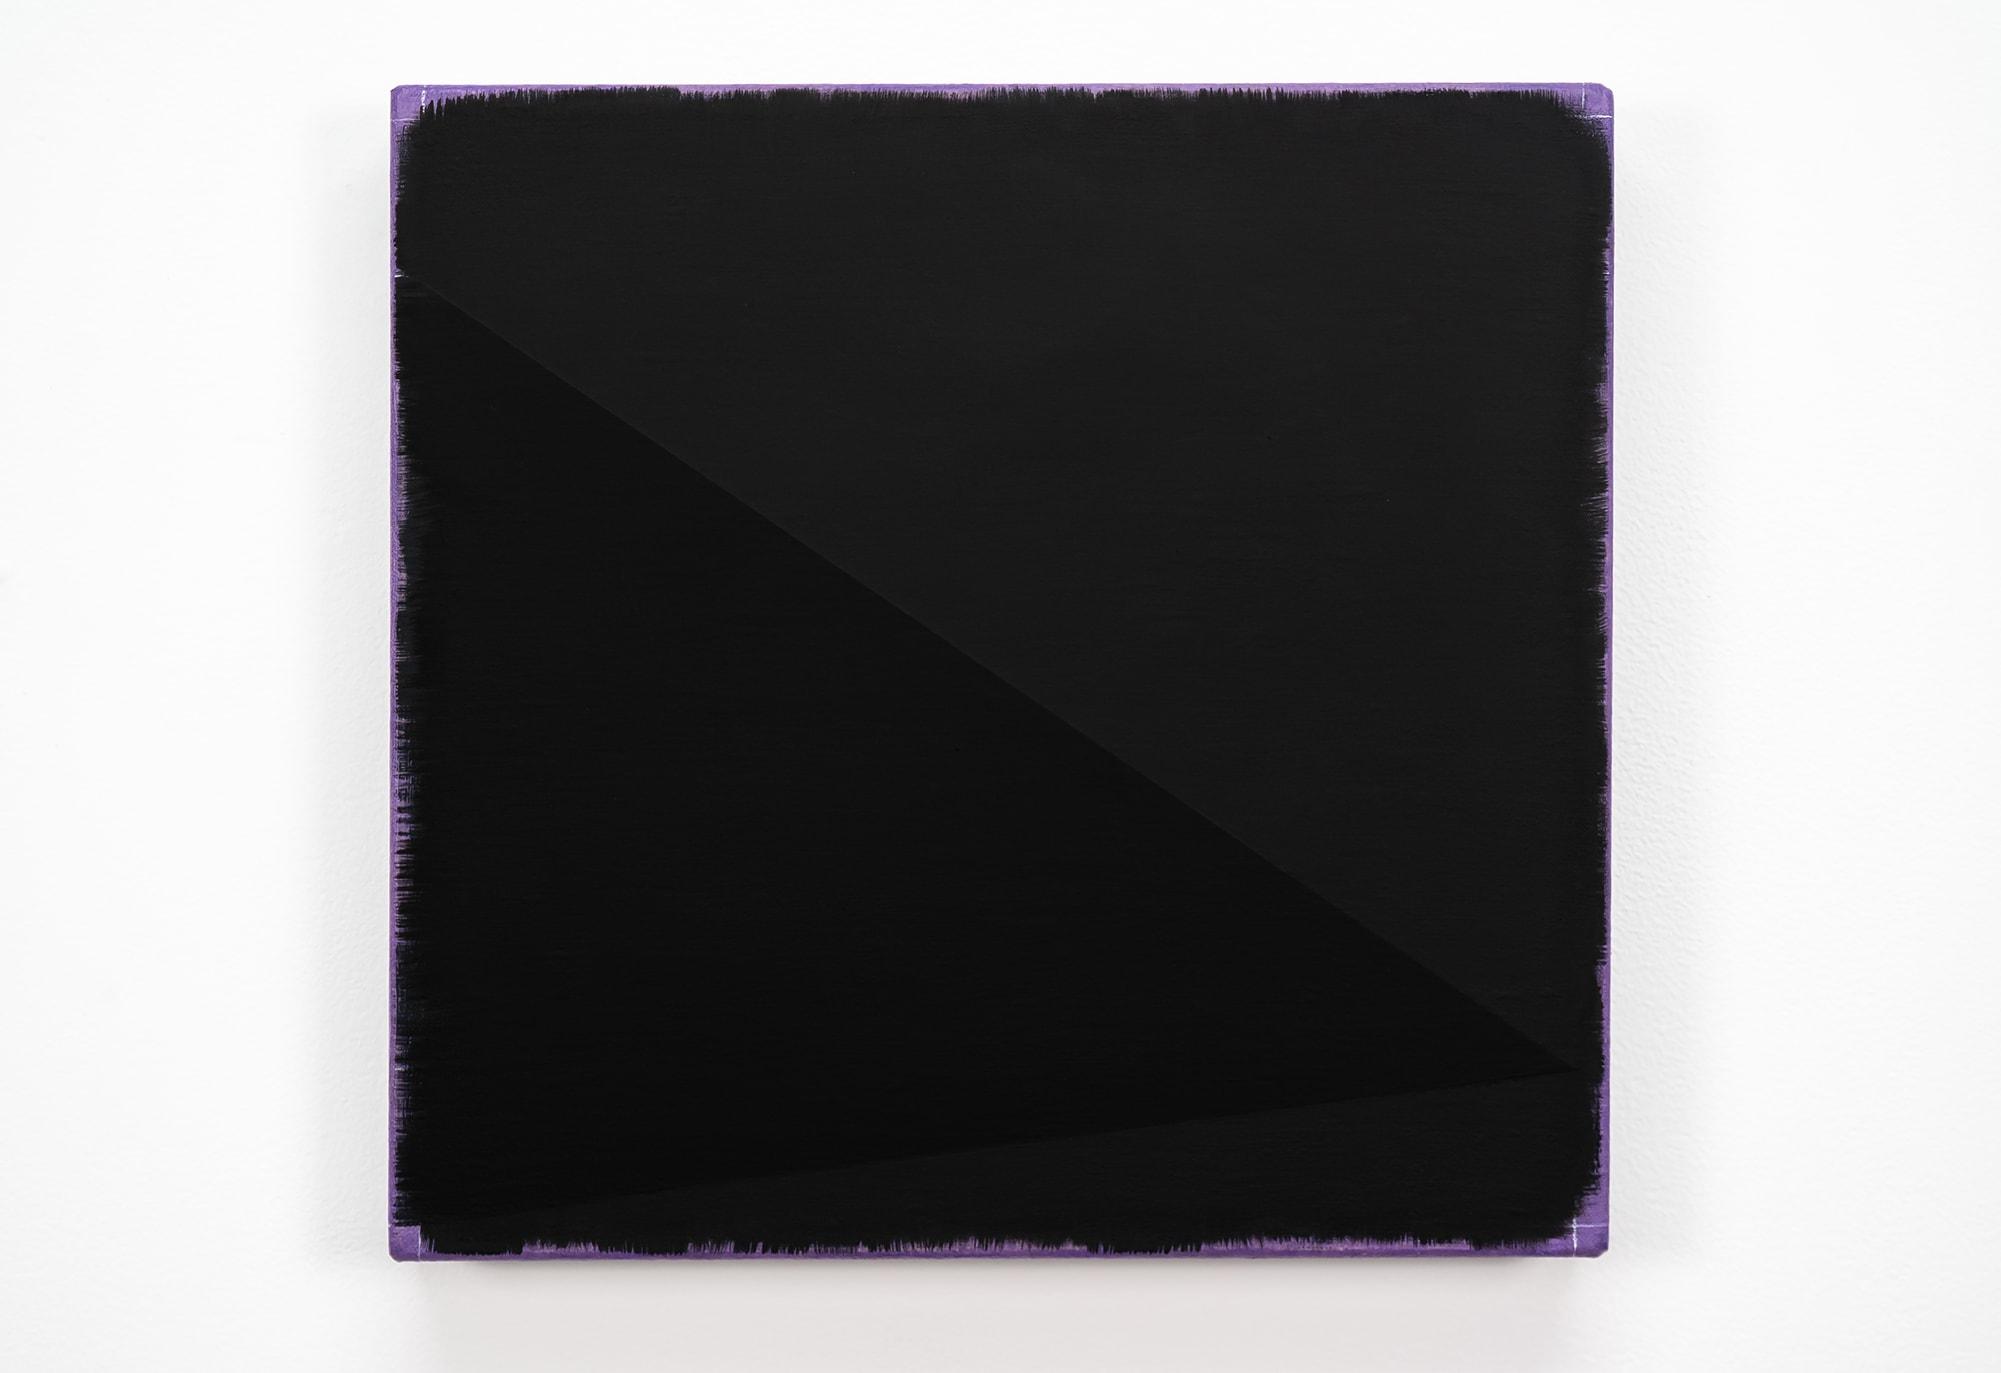 Randy Gibson : Rational Wedge 49:8 (Black)